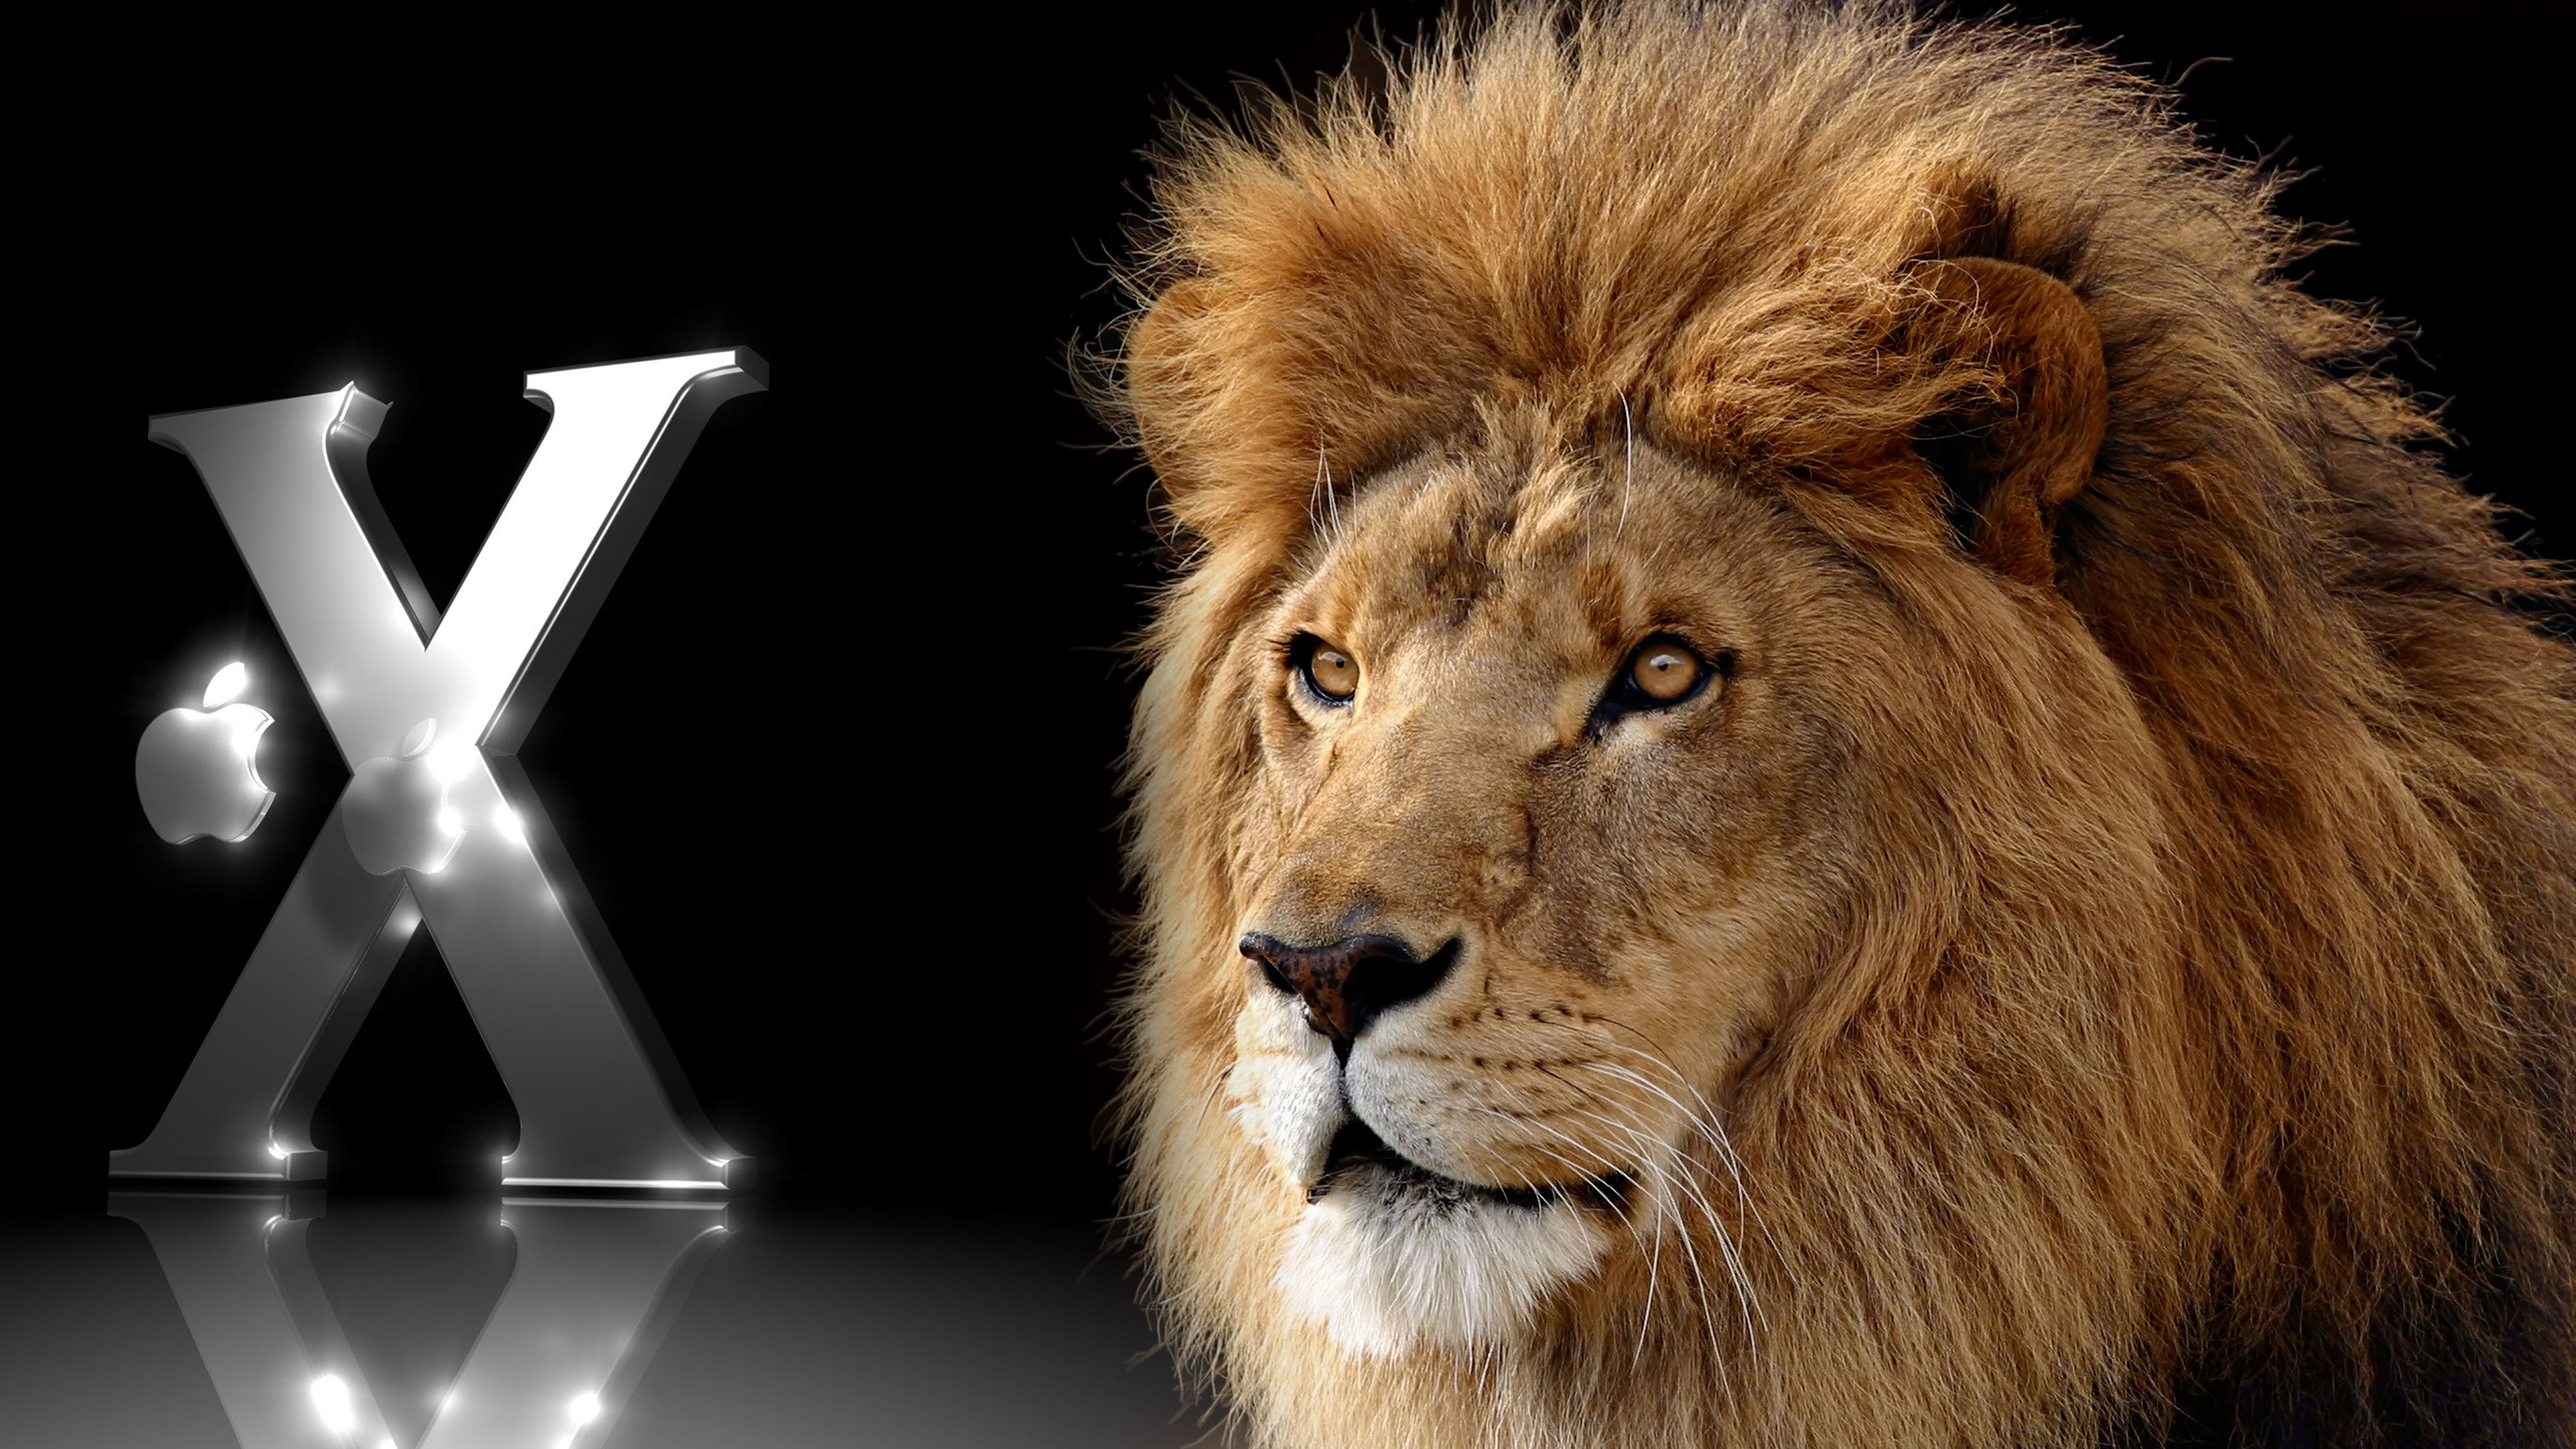 apple's lion release of mac os x desktop wallpaper